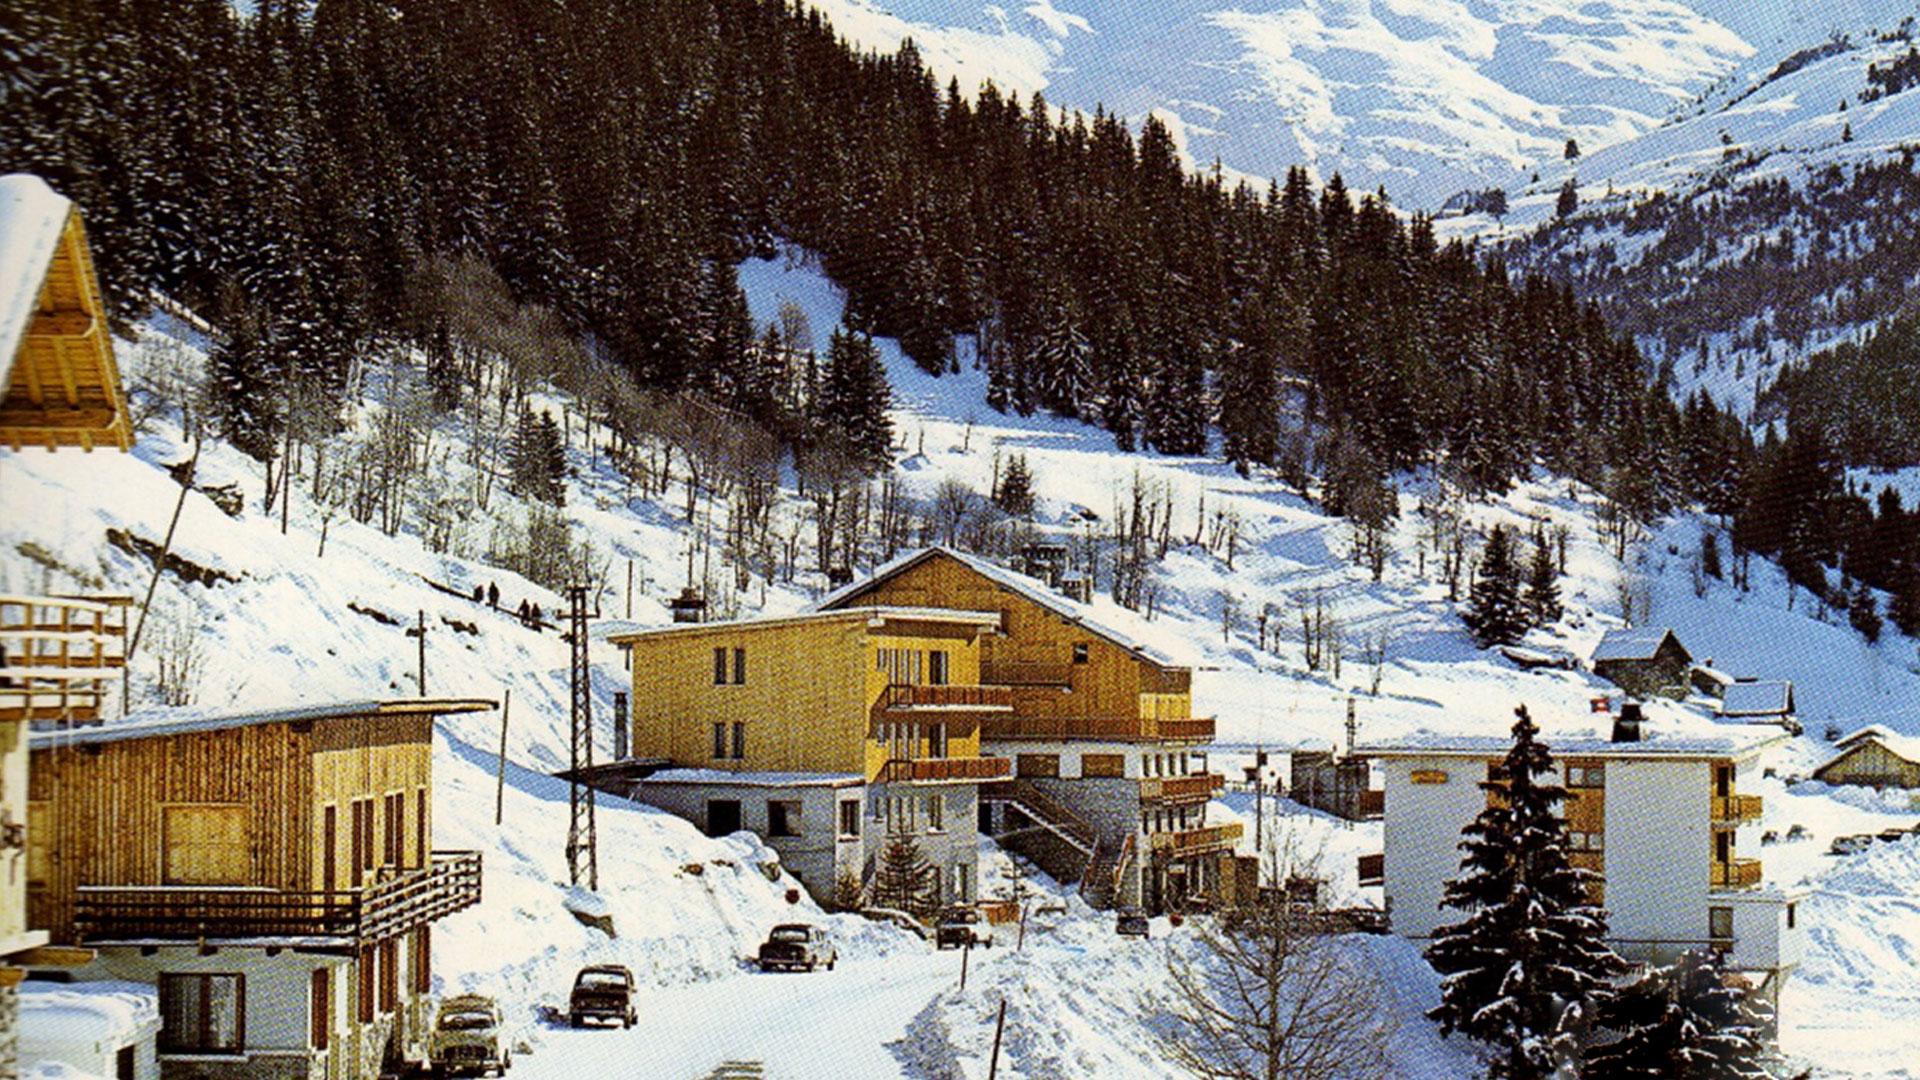 paysage enneigé hotel 3 etoiles alpes